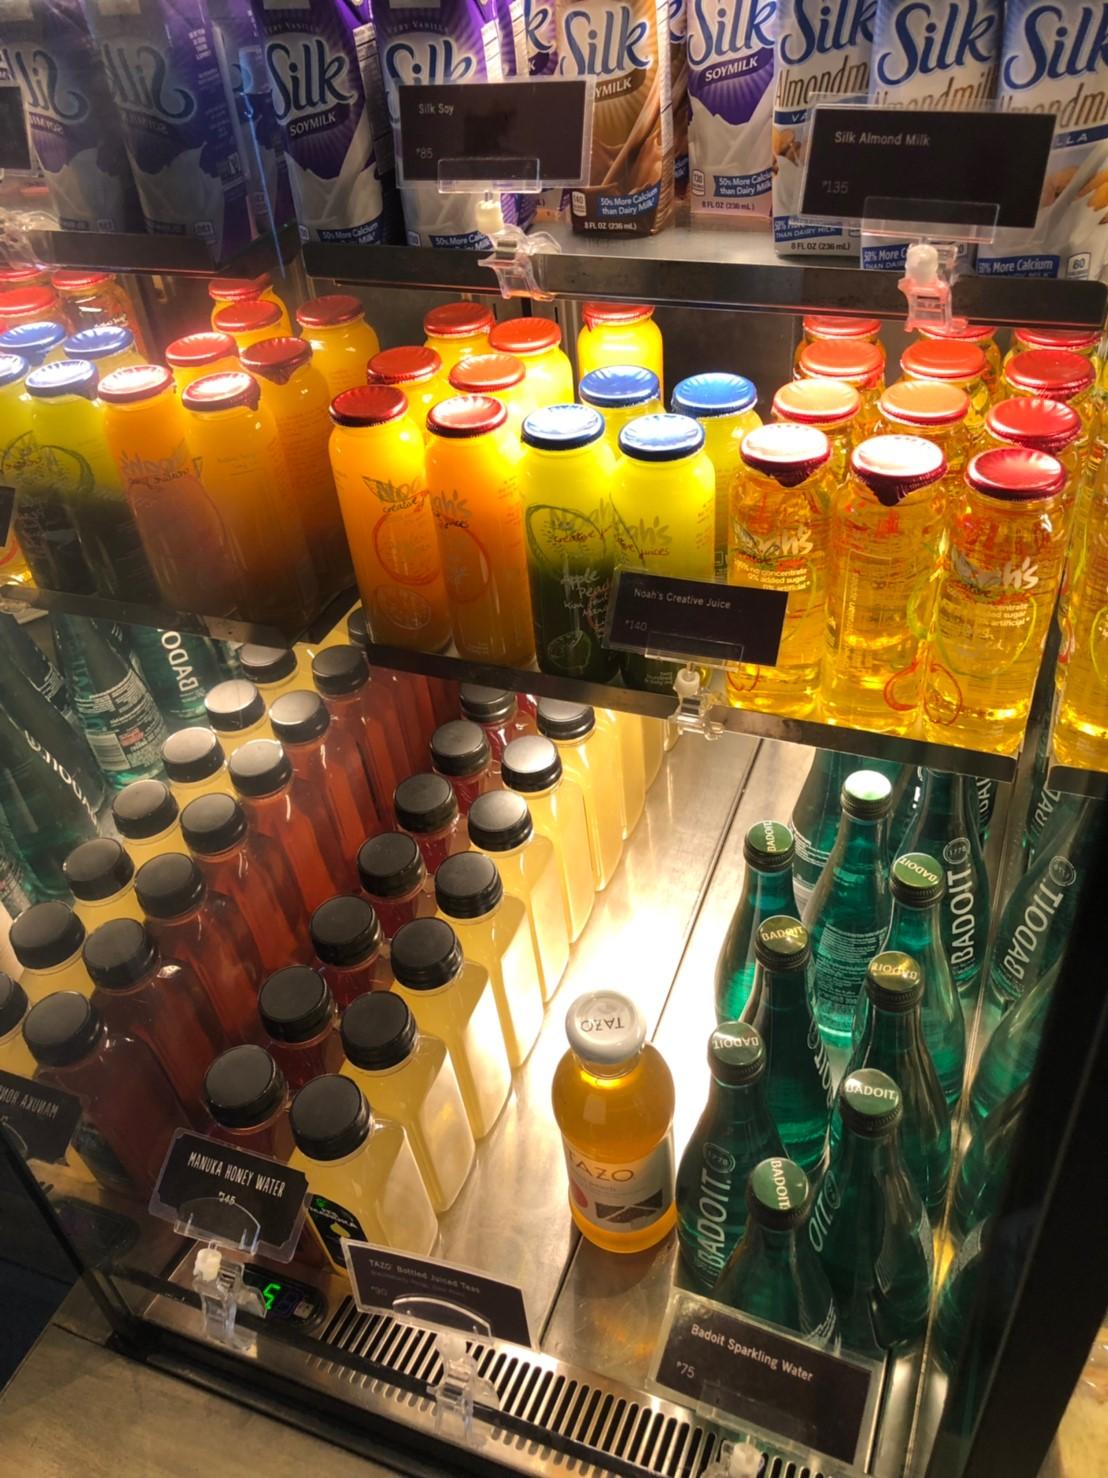 "Cebu_Starbucks_drinks_019"""""